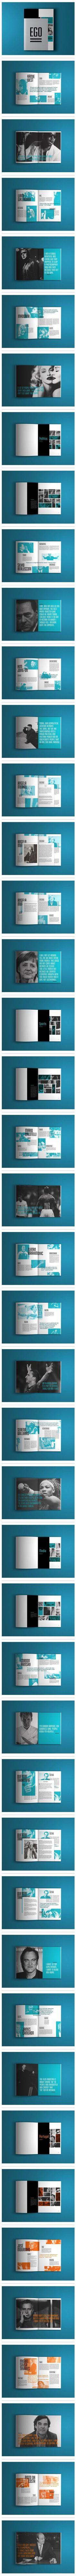 by Marisa Passos > www.marisapassos.com